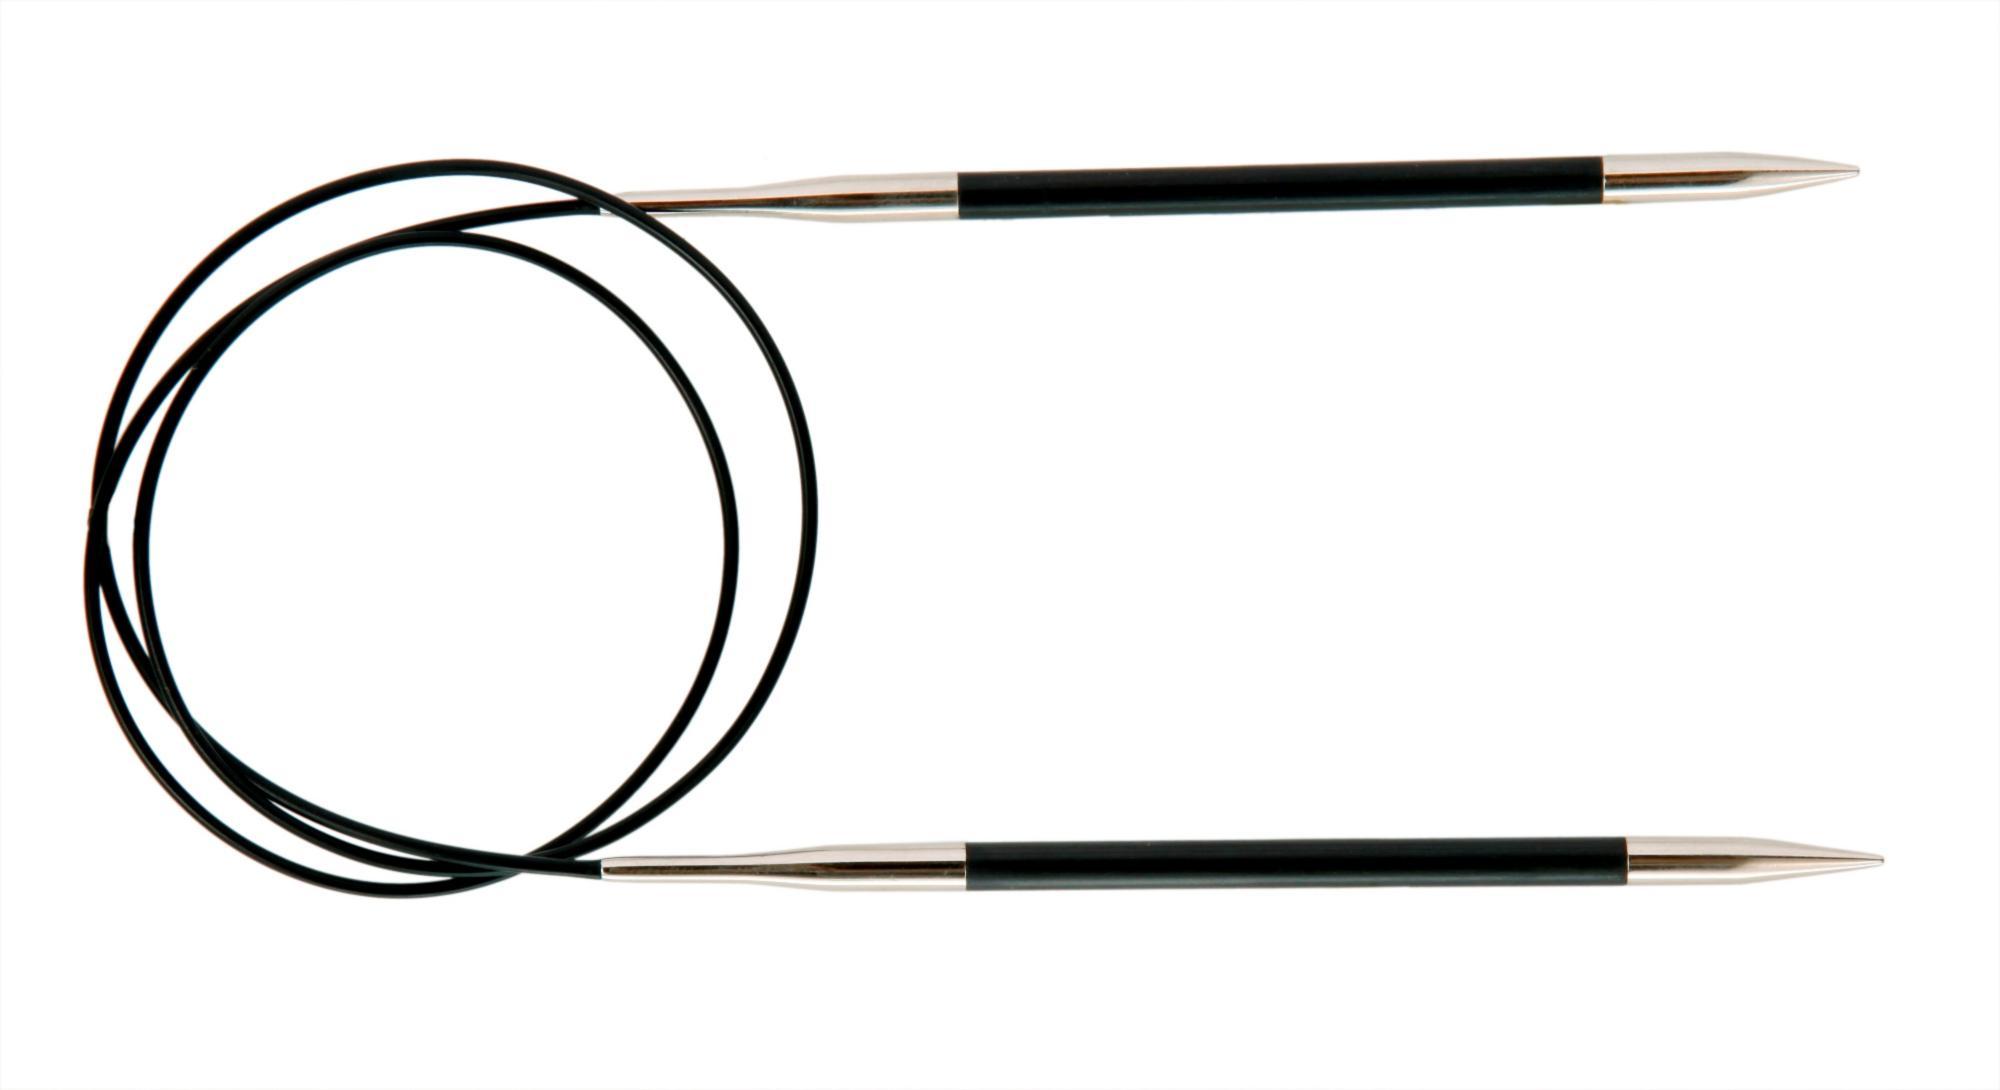 Спицы круговые 60 см Karbonz KnitPro, 41166, 3.50 мм